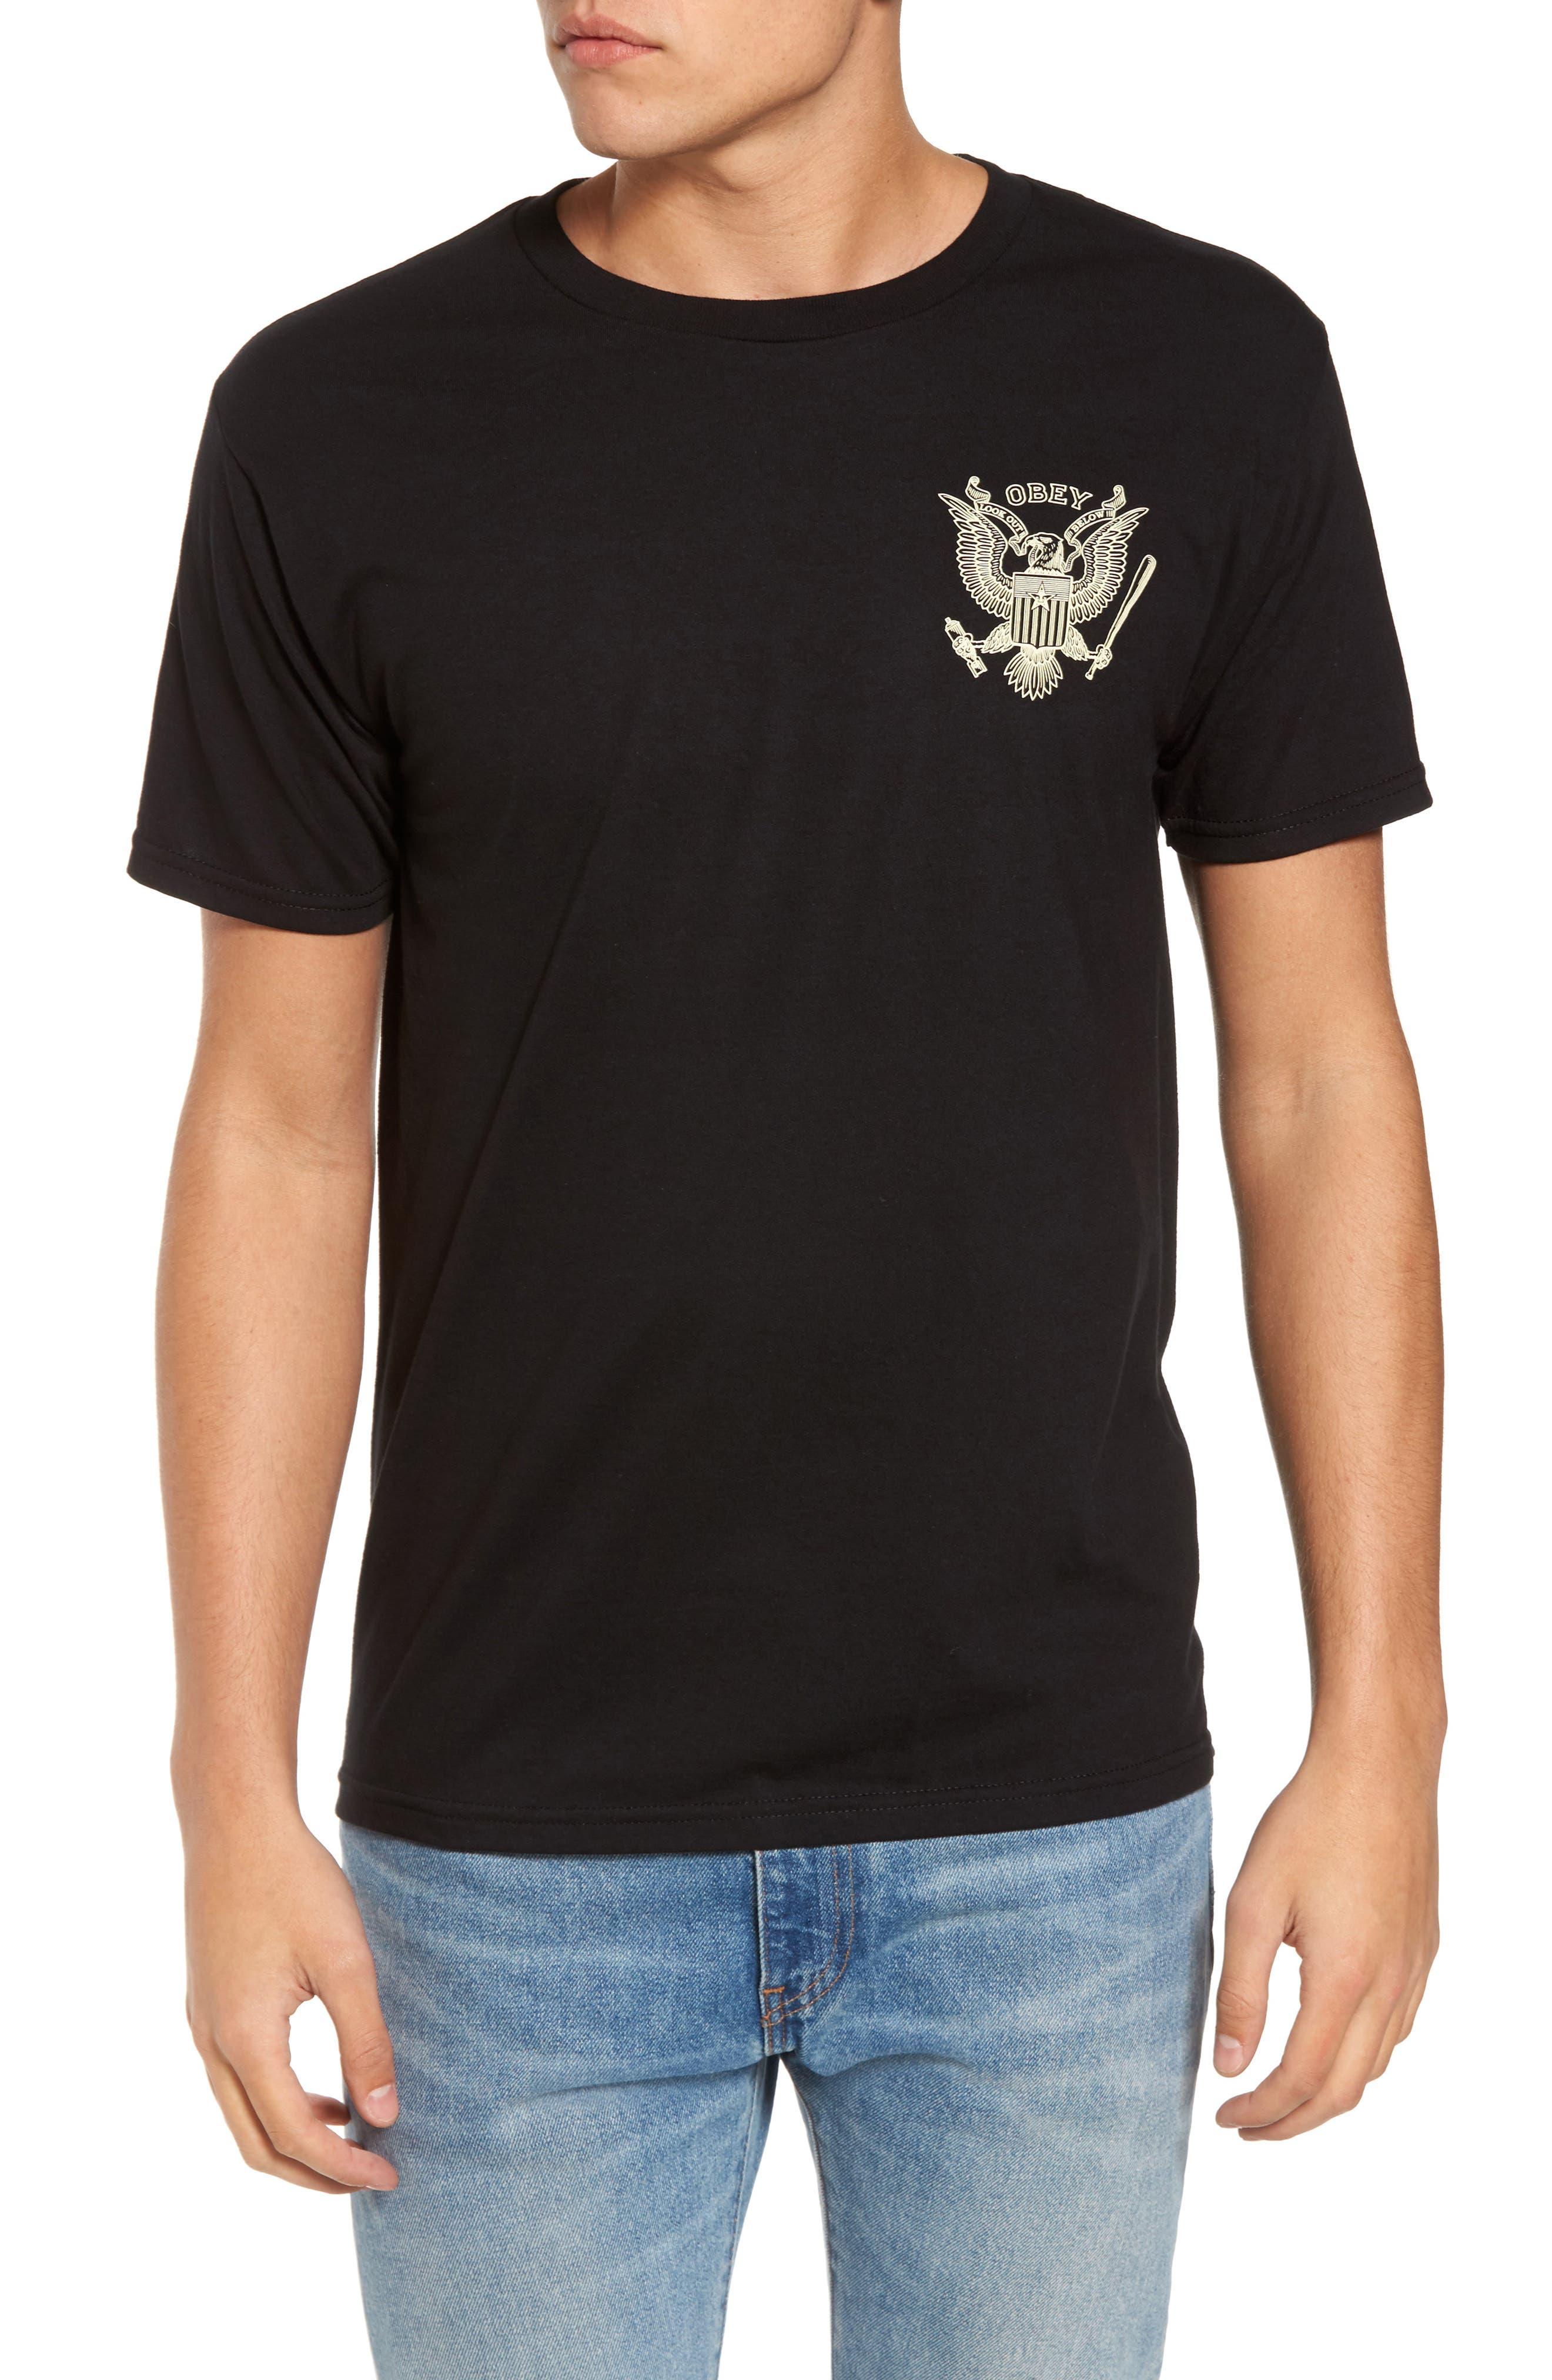 Look Out Below Premium Graphic T-Shirt,                         Main,                         color, Black